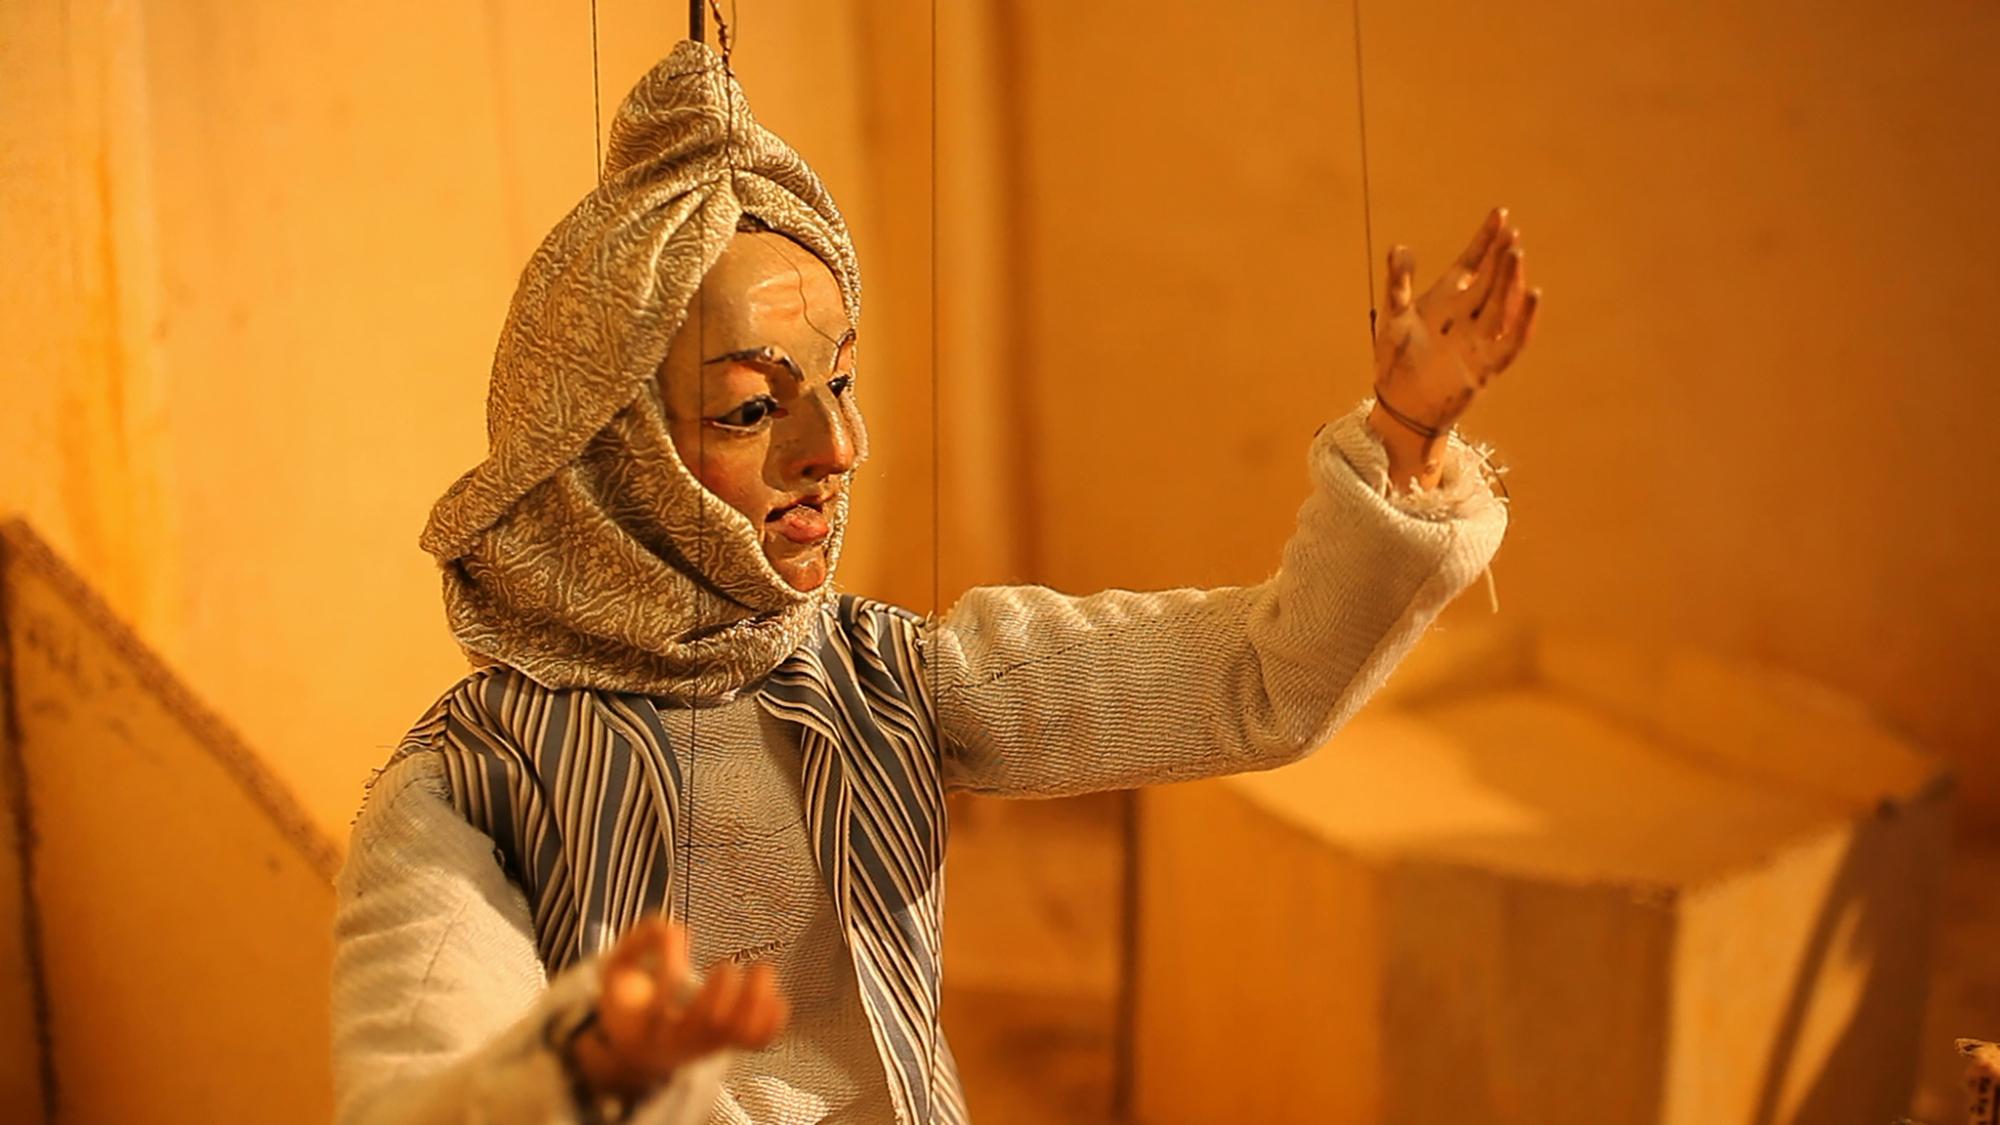 Still of Wael Shawky, Cabaret Crusades I: The Horror Show File (2010) © Wael Shawky, courtesy Lisson Gallery